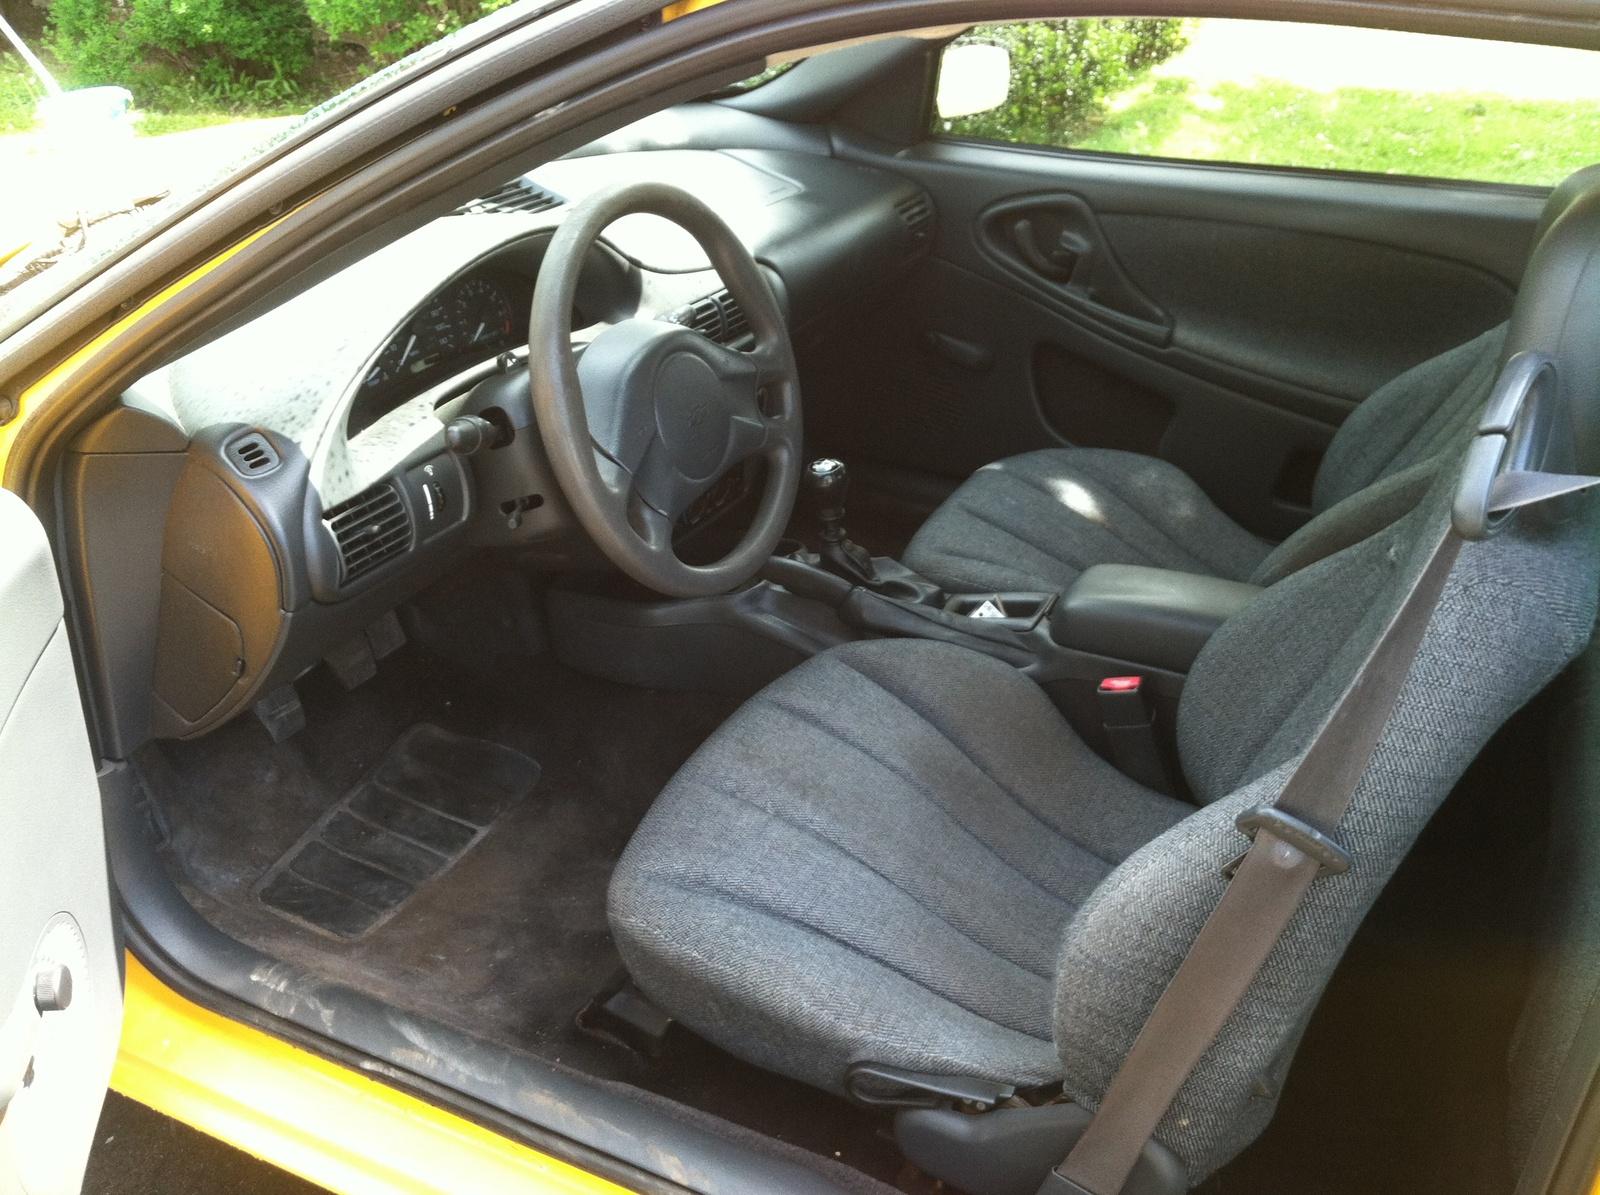 2003 chevrolet cavalier pictures cargurus - 2003 chevy cavalier interior parts ...